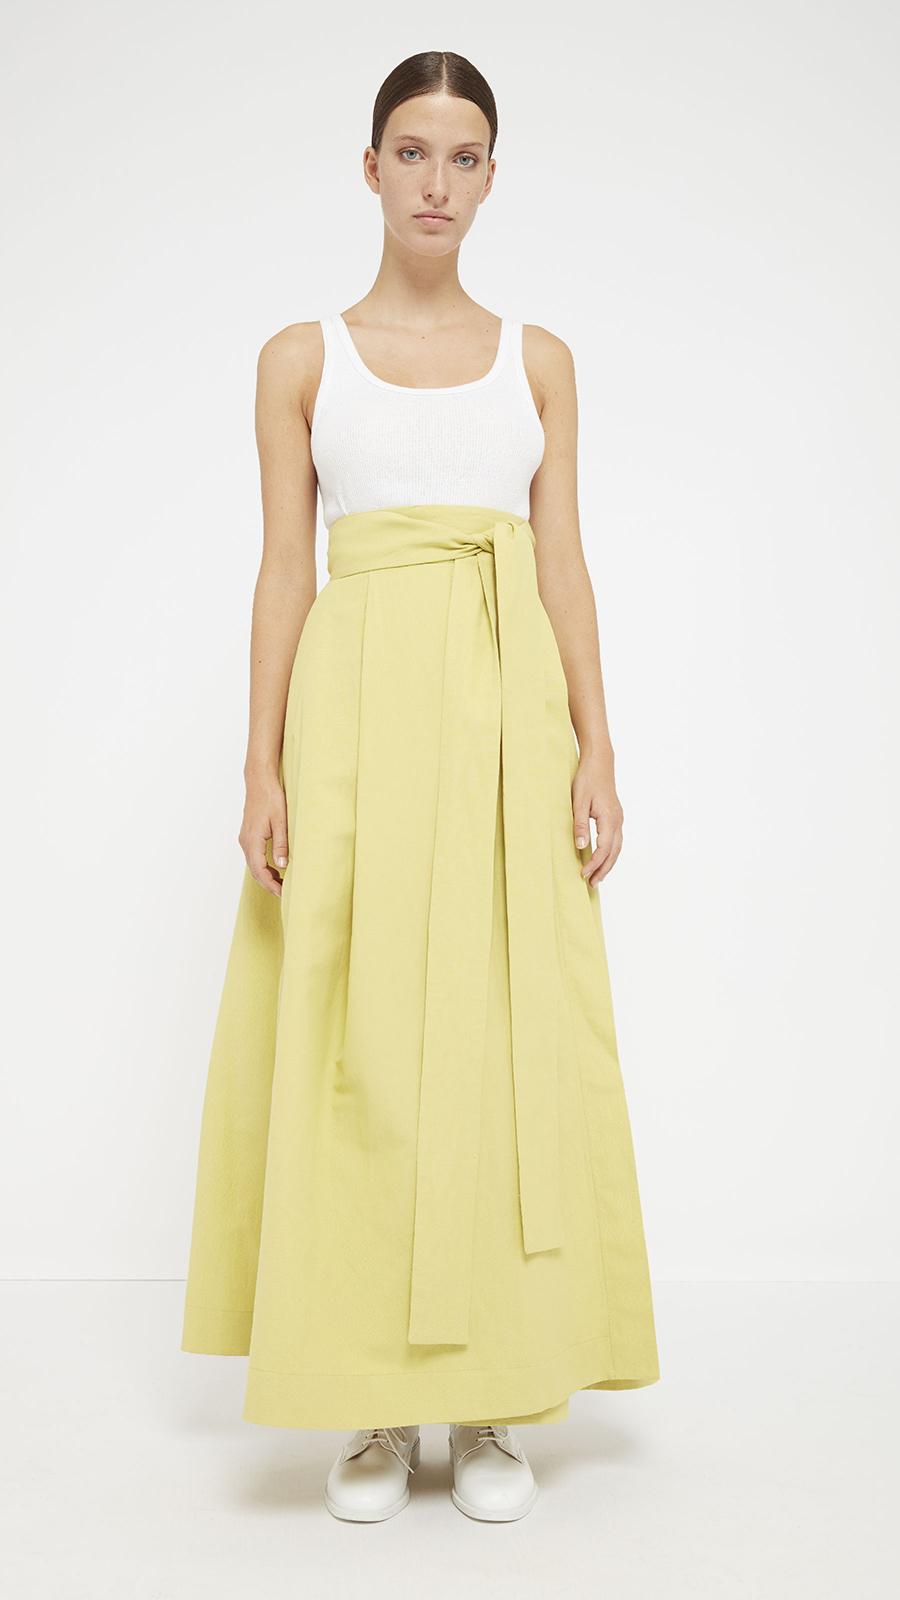 dada-diane-ducasse-jupe-longue-coton-lin-jaune-pe-17-face